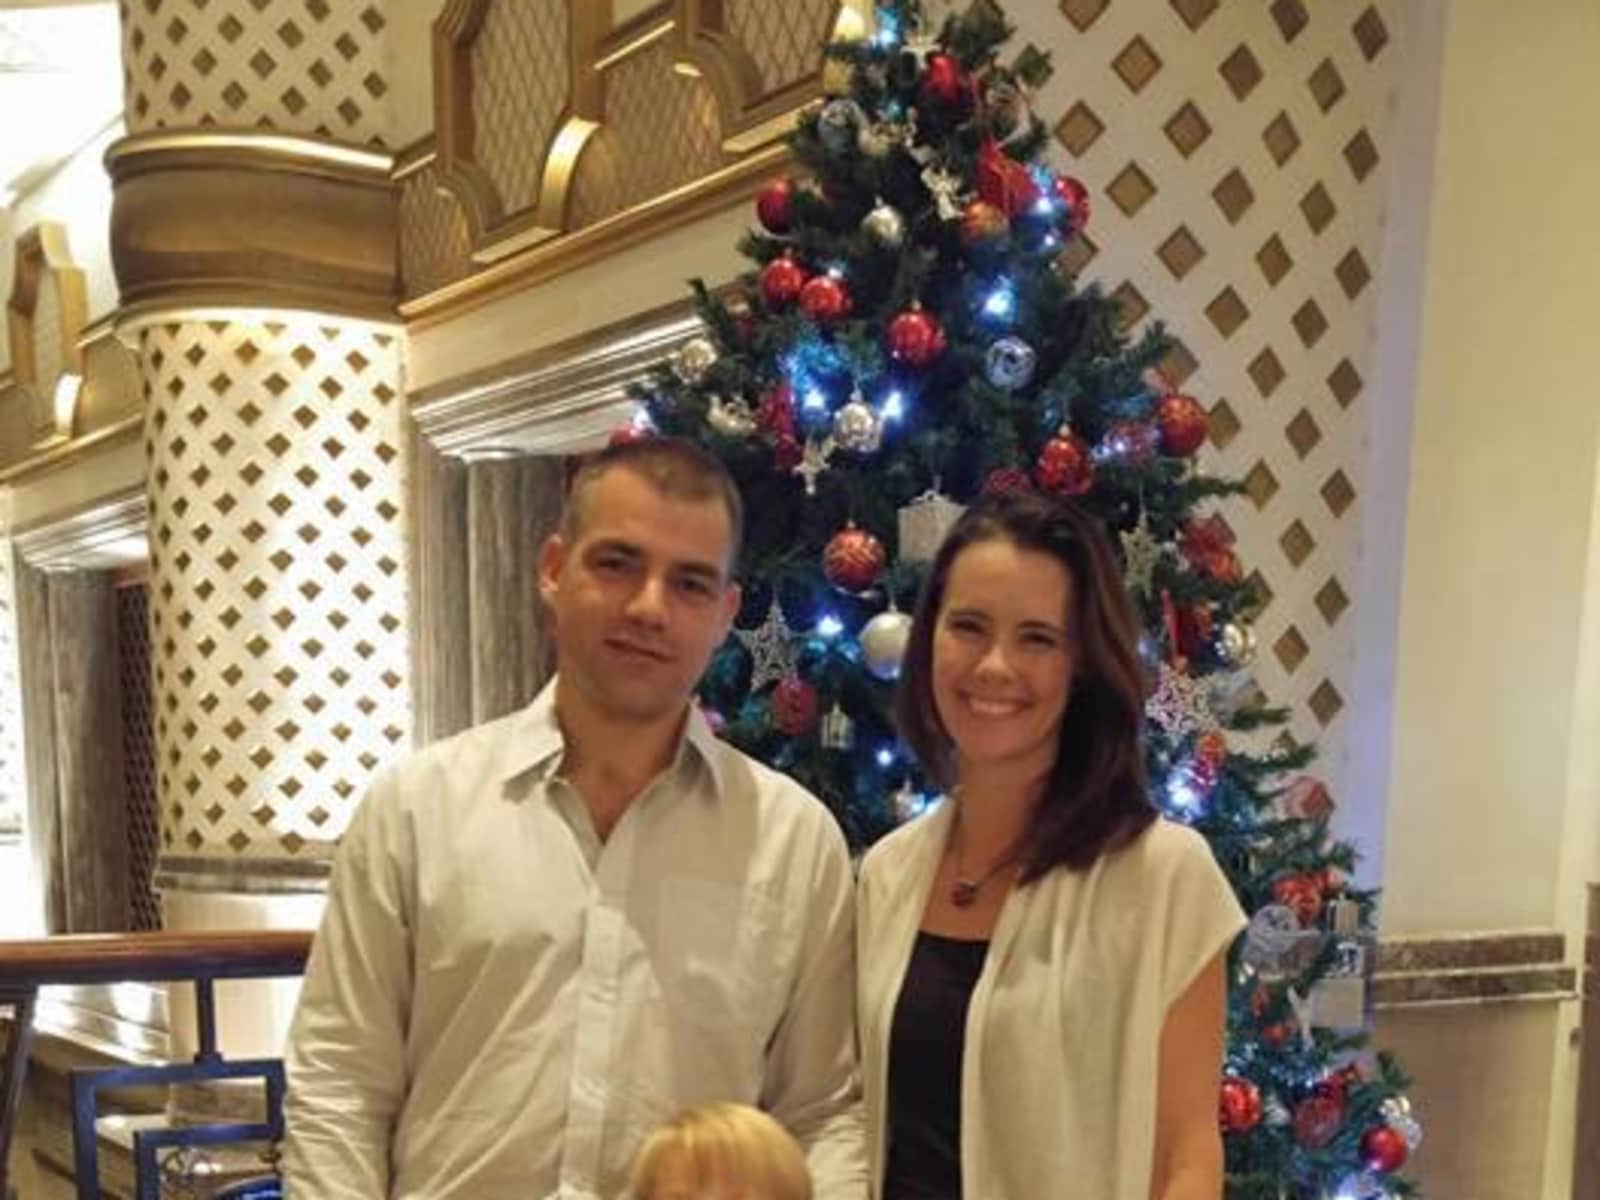 Eben & Helga from Muscat, Oman